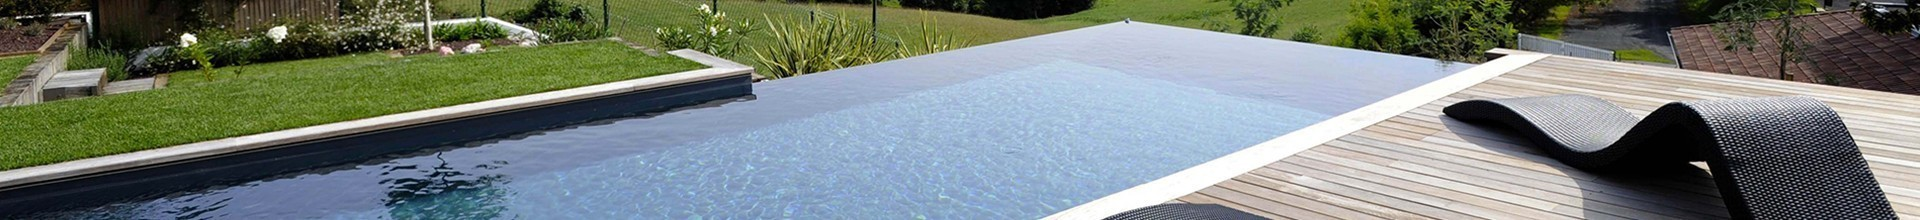 Direct usine, piscine coque prix Maine-Loire